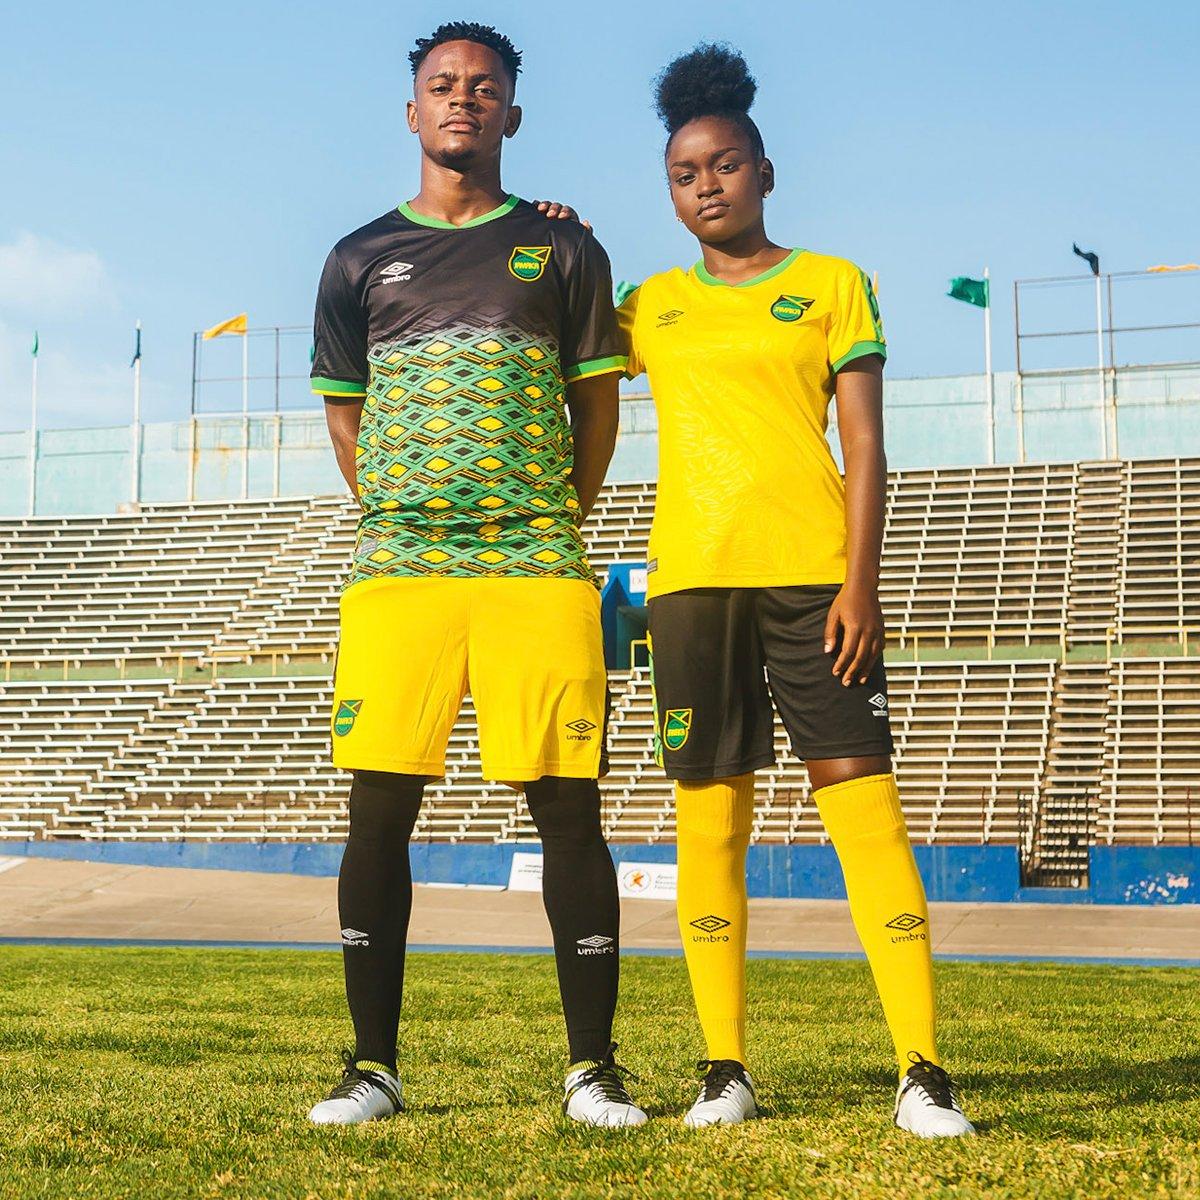 Jamaica 2018-19 Umbro Home And Away Kit